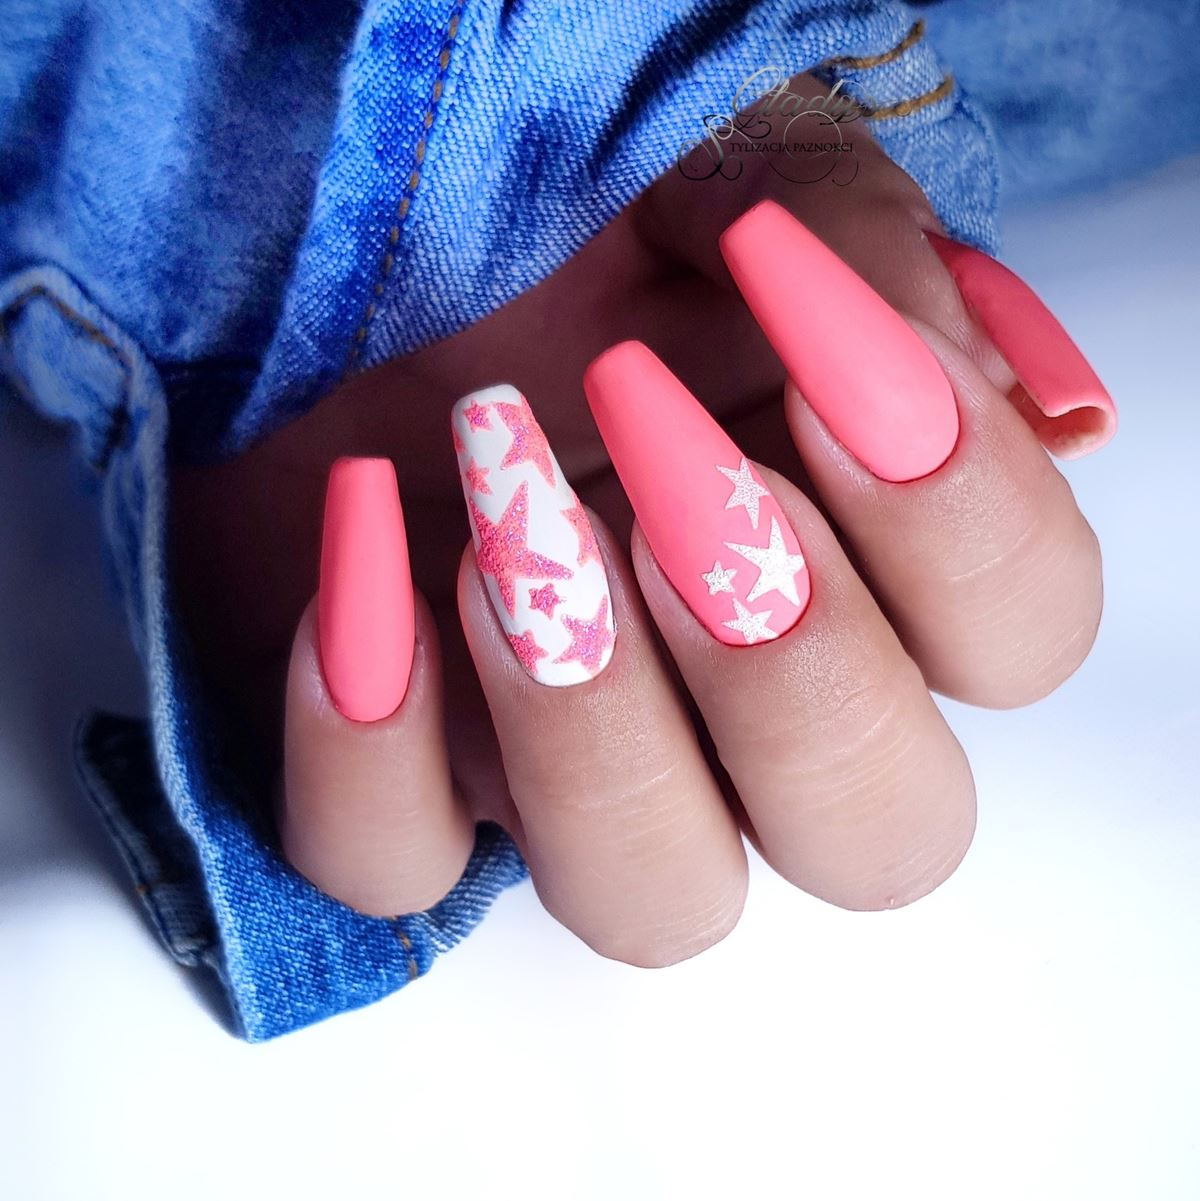 różowe neonowe paznokcie matowe